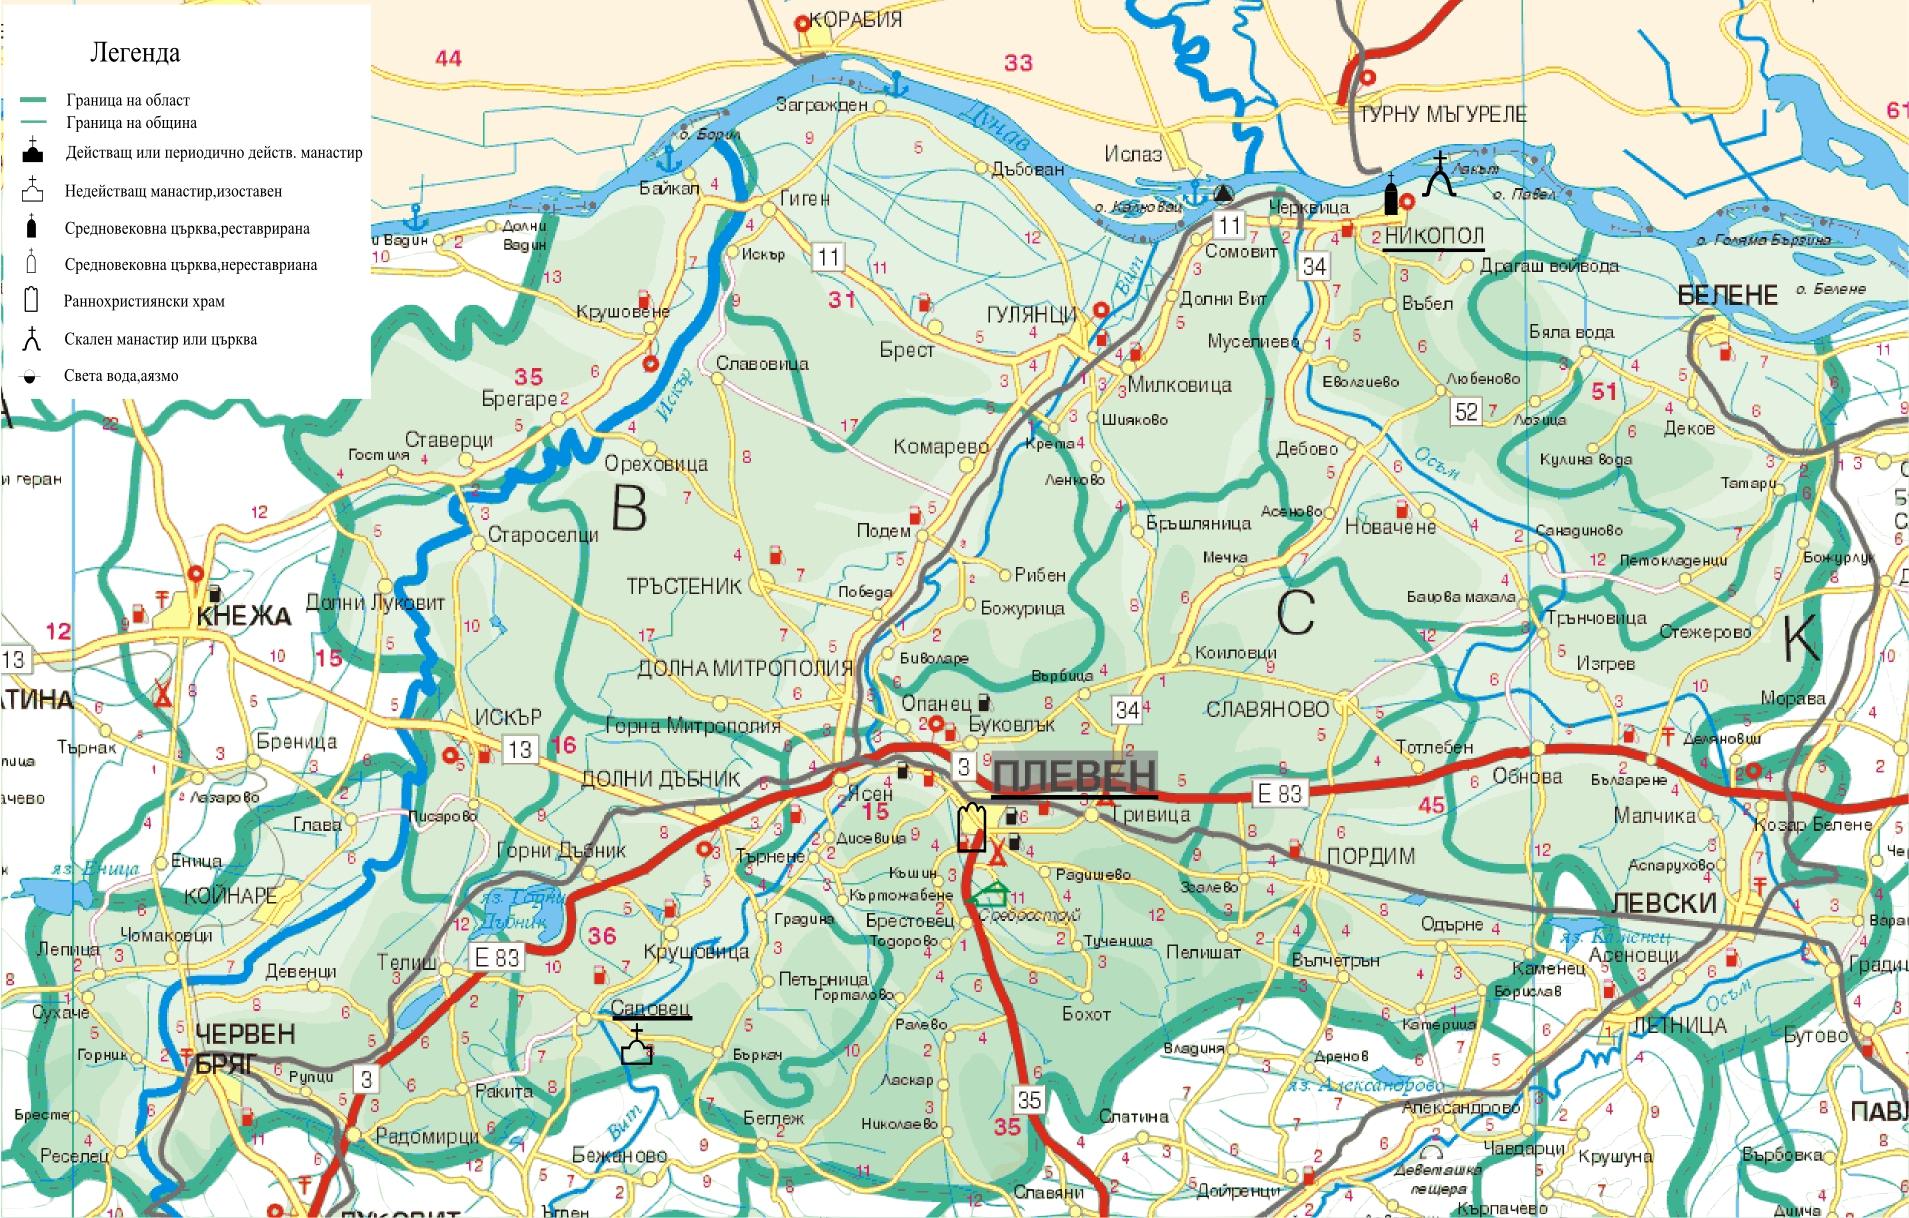 Plevenska Oblast Sveti Mesta